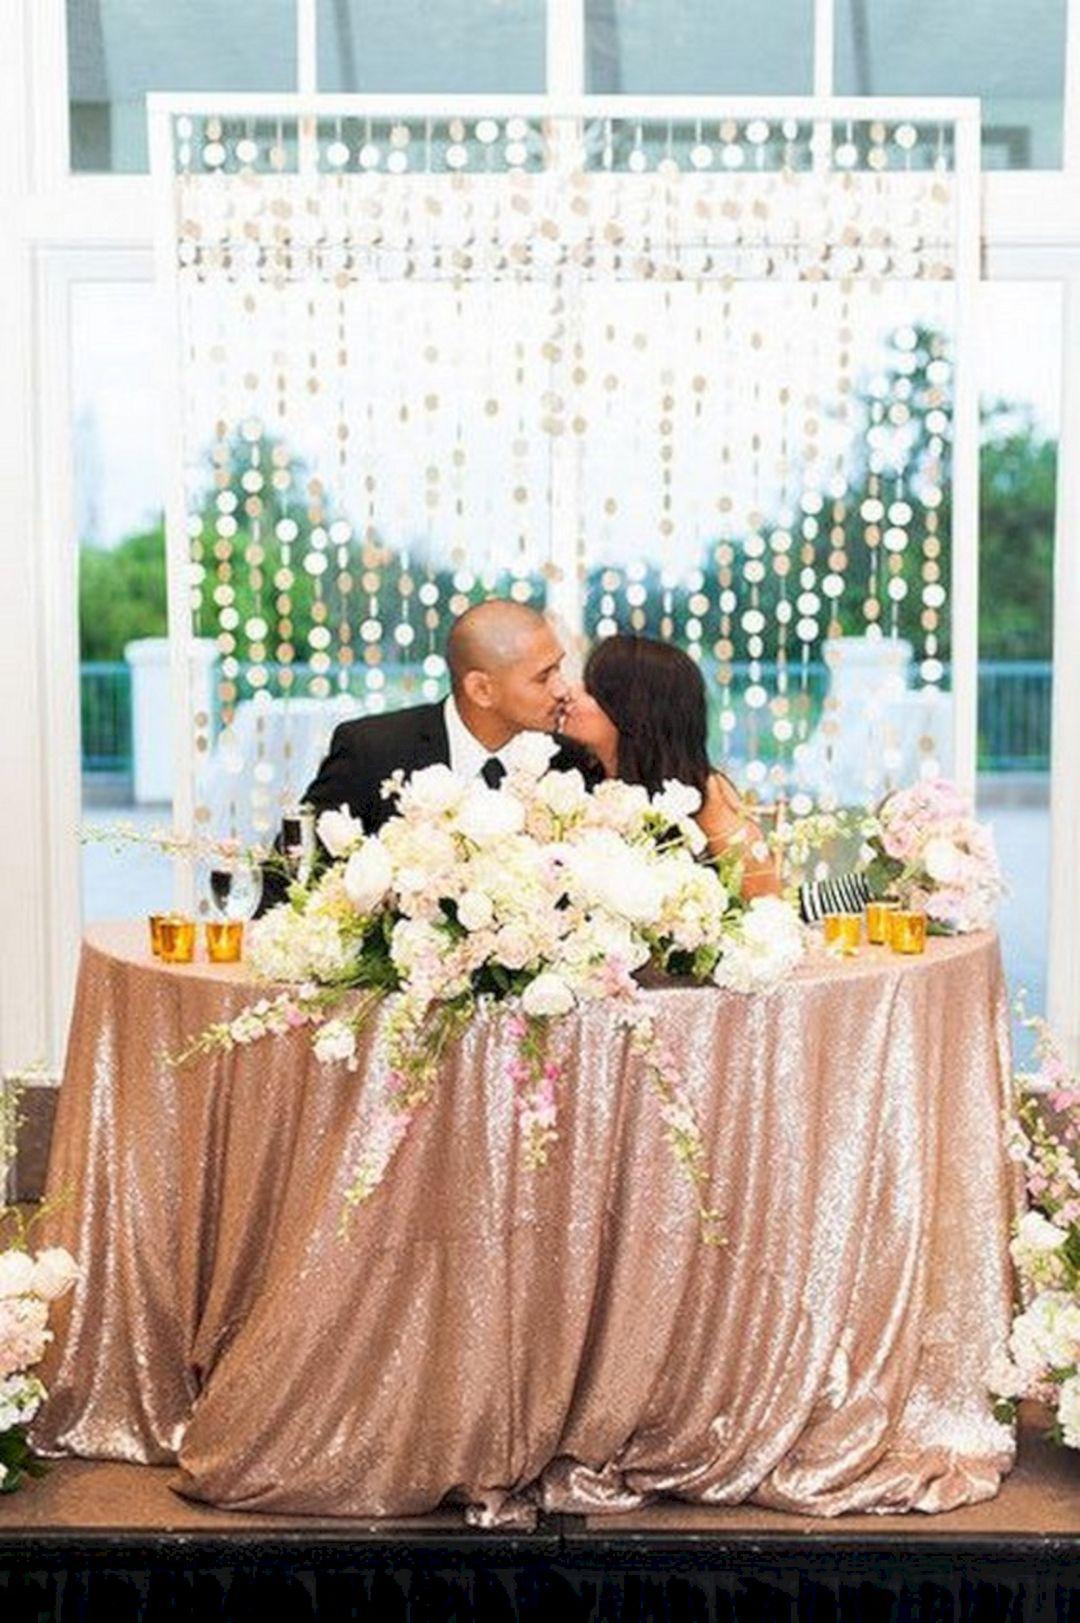 Ideas of wedding decorations  Best Inspirations  Awesome Pool Wedding Decorations Ideas  Pool